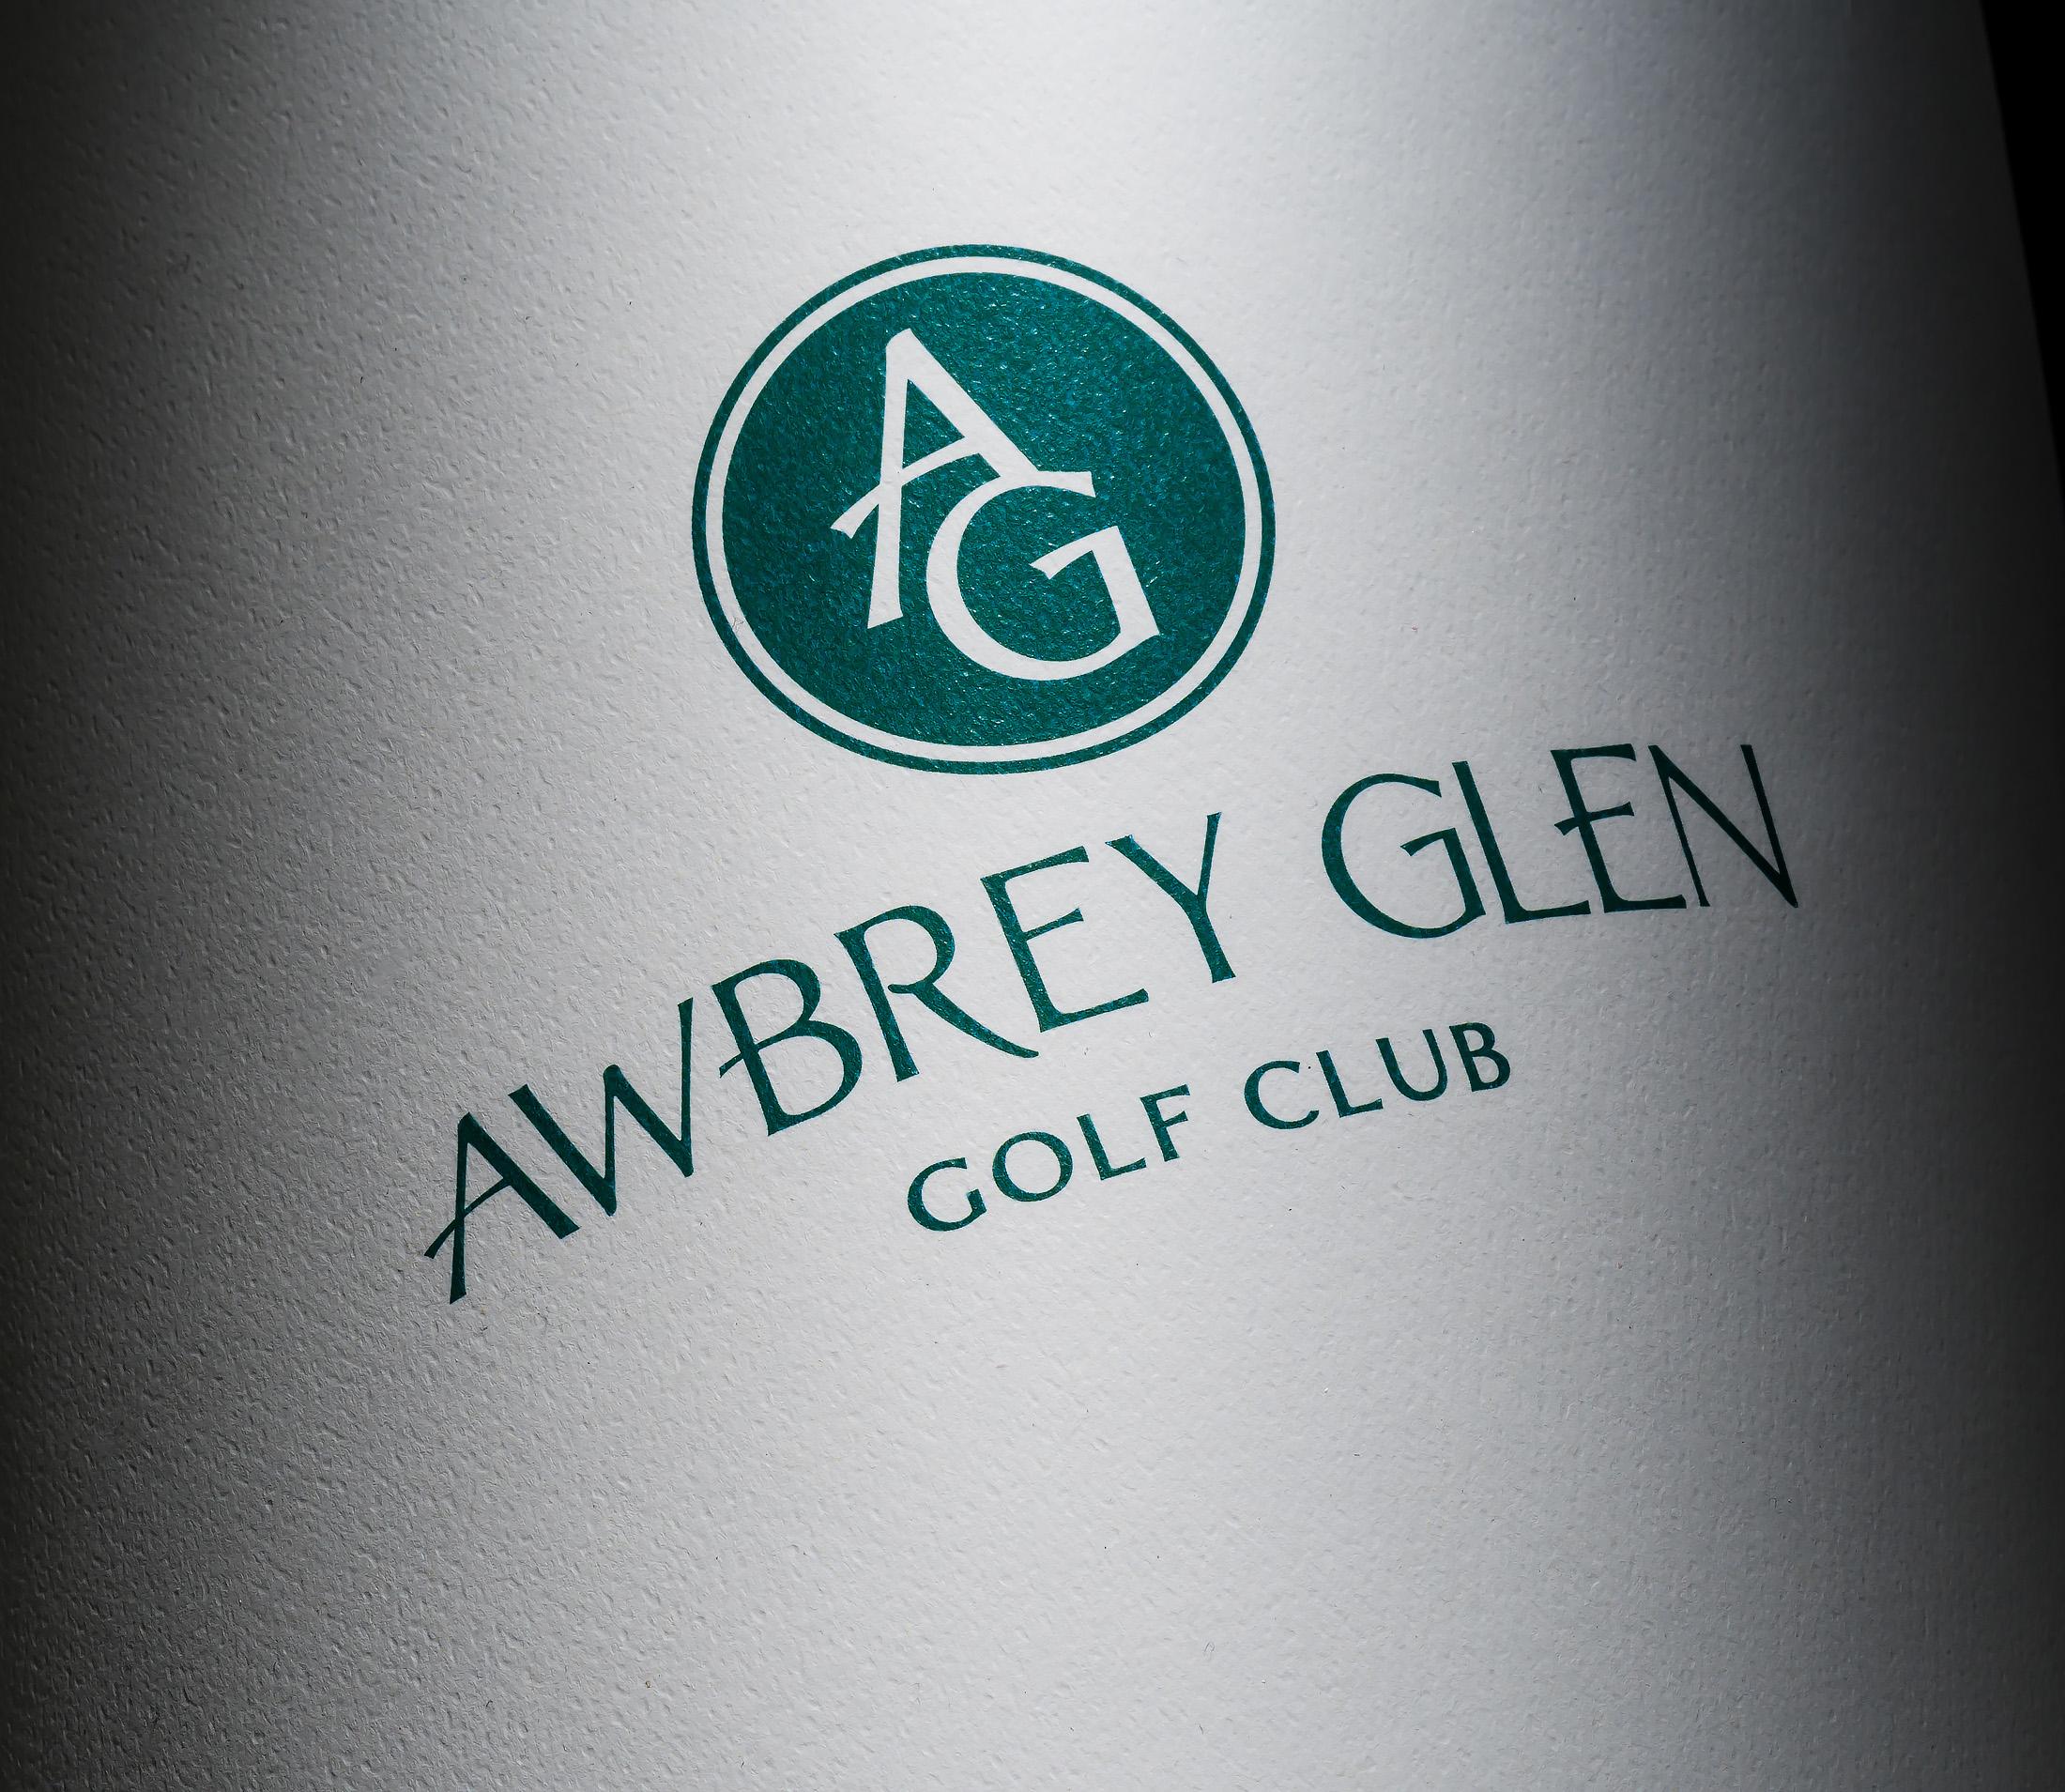 Awbrey-Glen